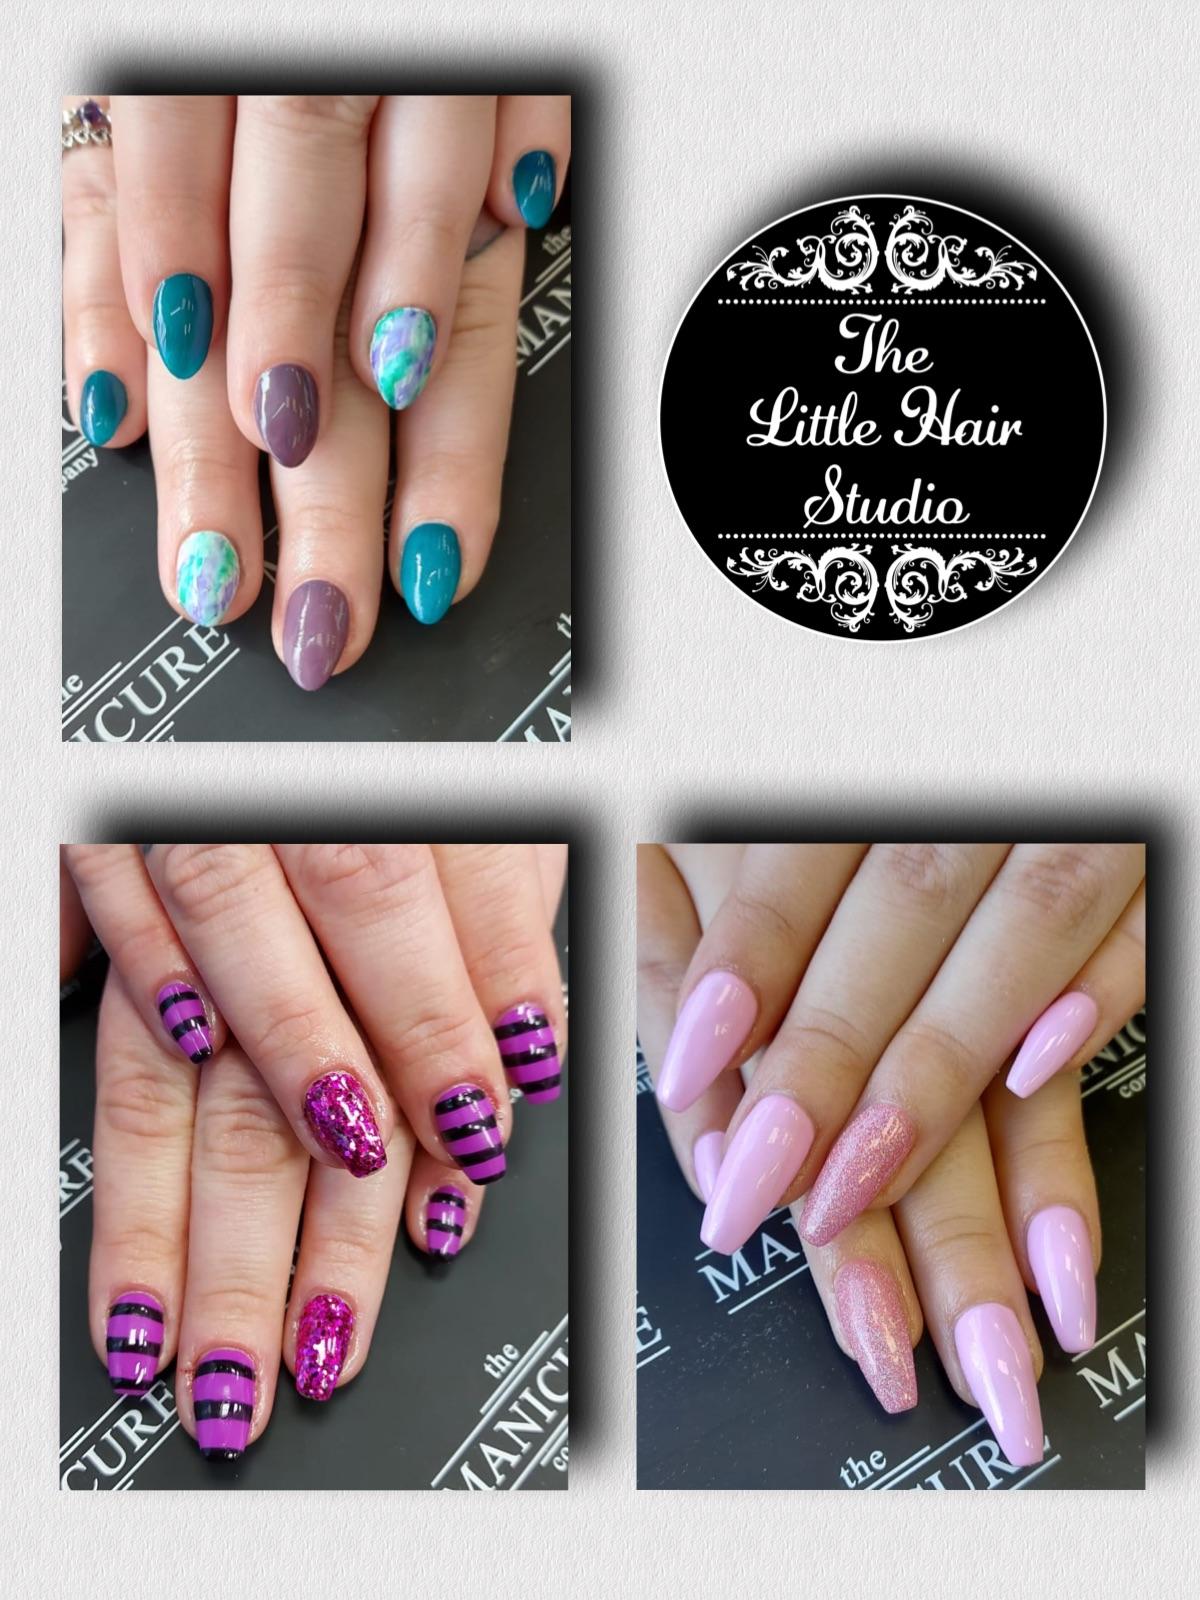 acrylic nails by Beth